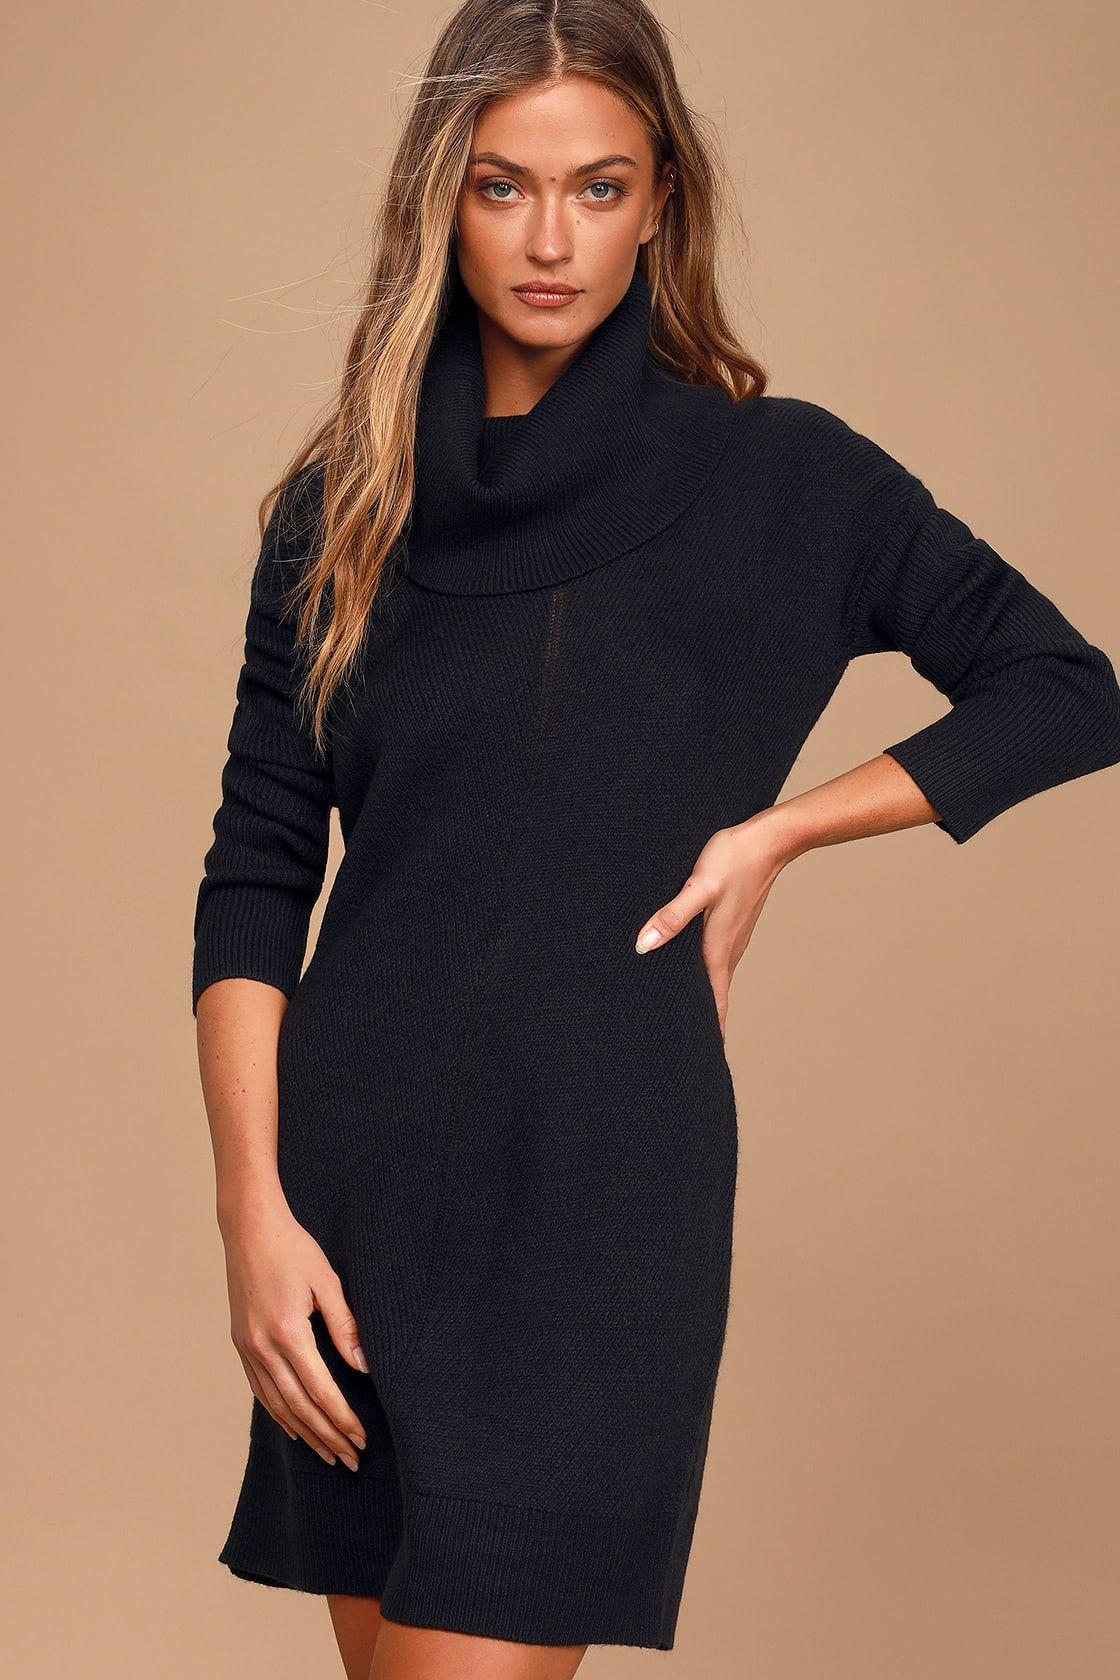 Tea Reader Black Sweater Dress [ 1680 x 1120 Pixel ]